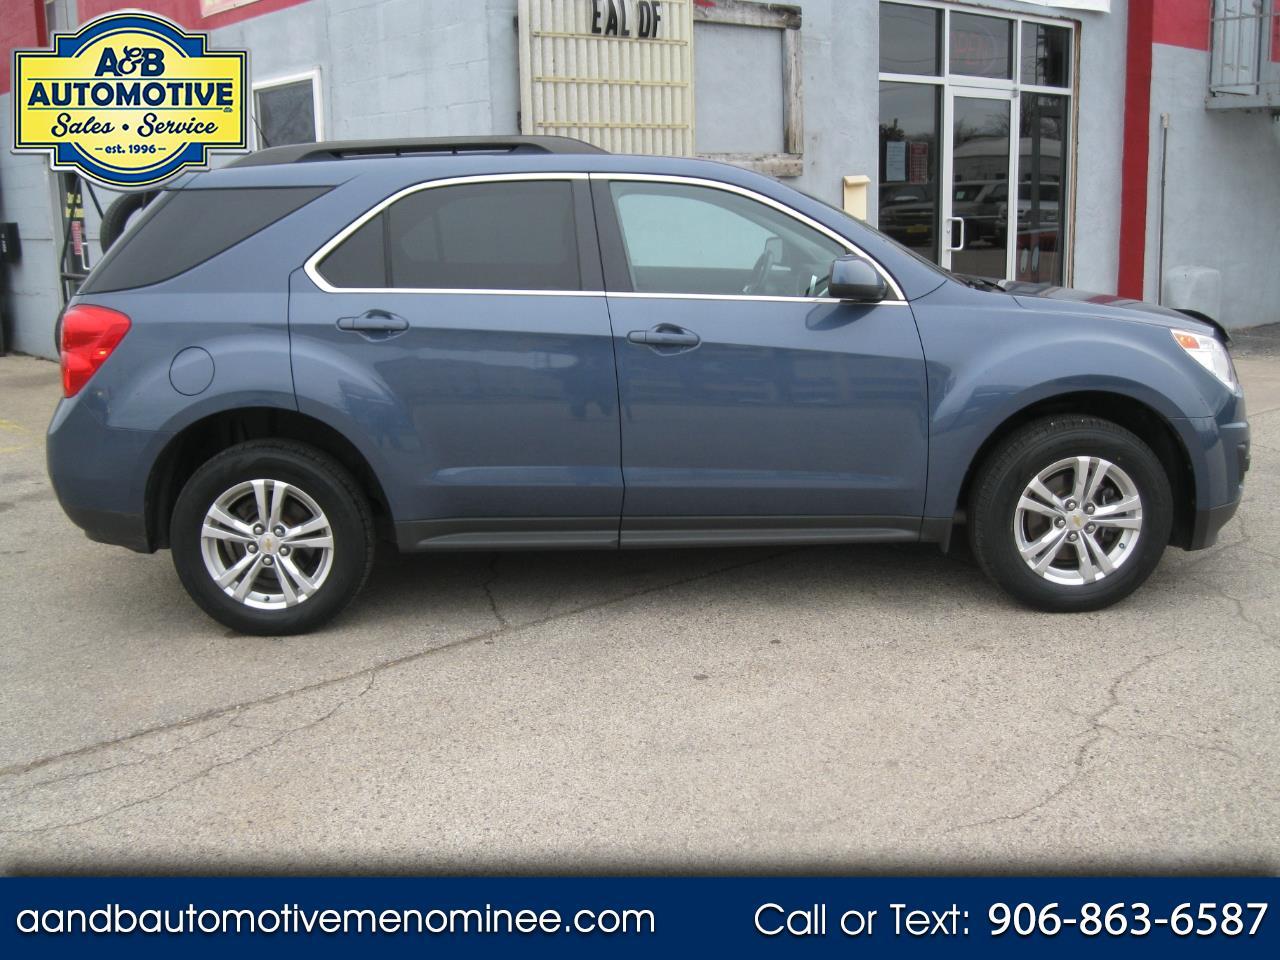 2011 Chevrolet Equinox AWD 4dr LT w/1LT